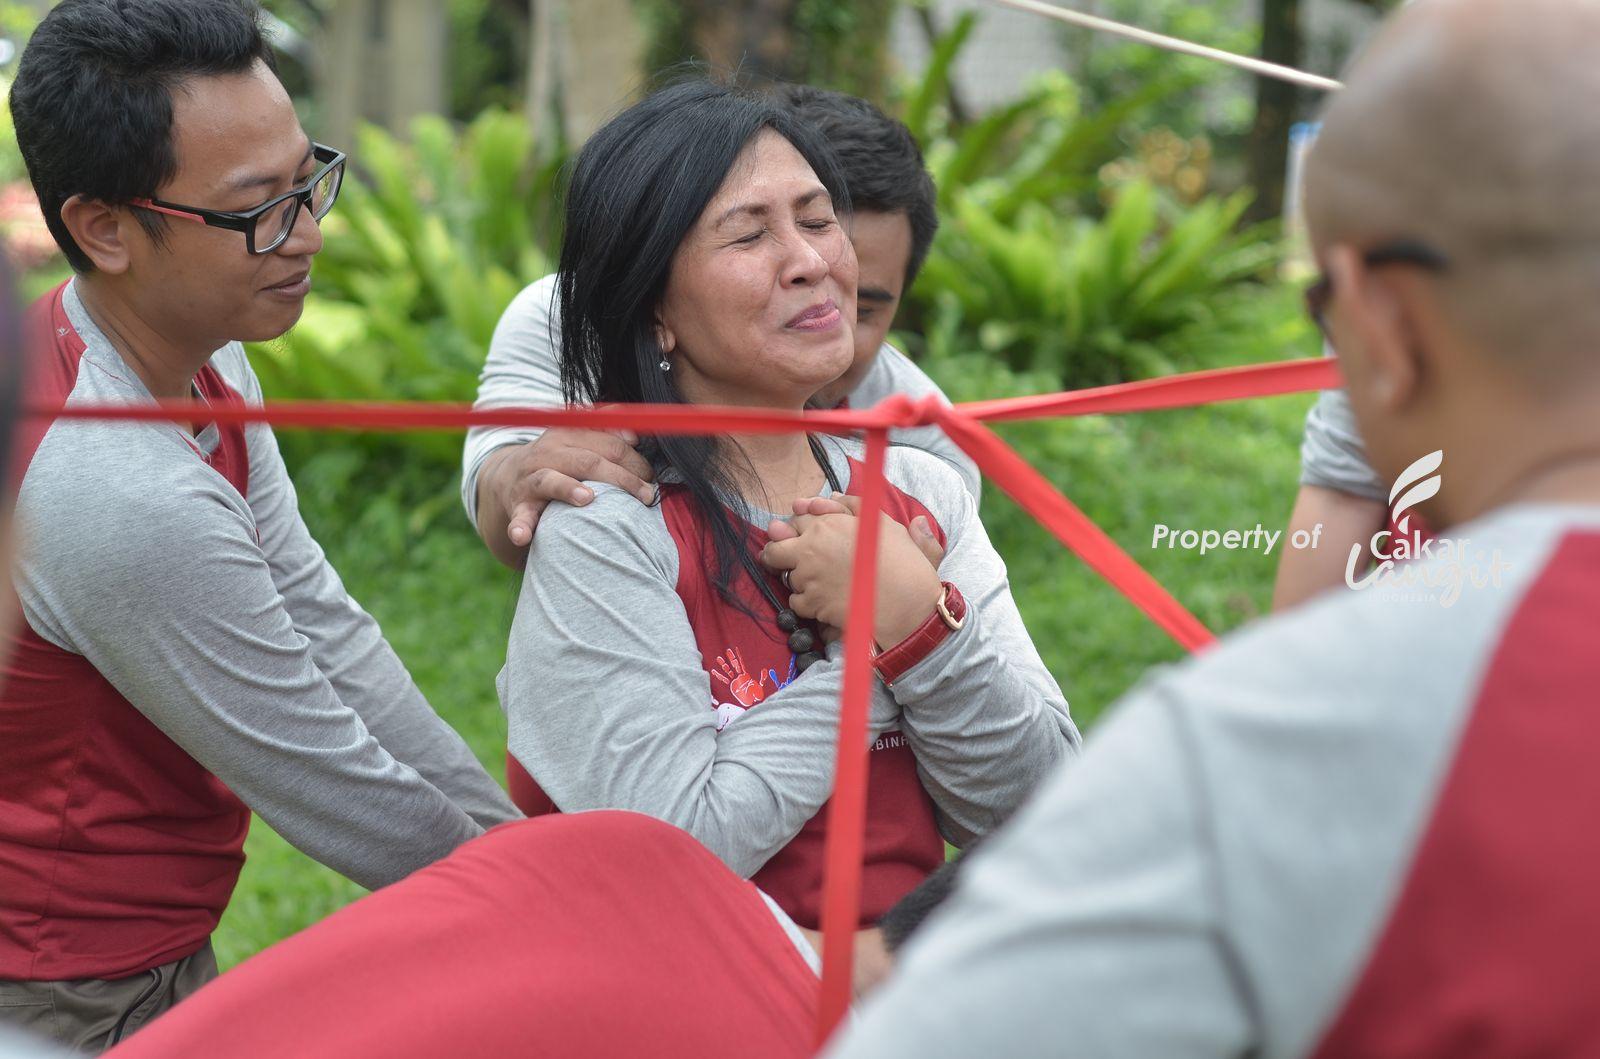 Harga Outbound popular di Bogor Sentul Hotel Gran Pesona